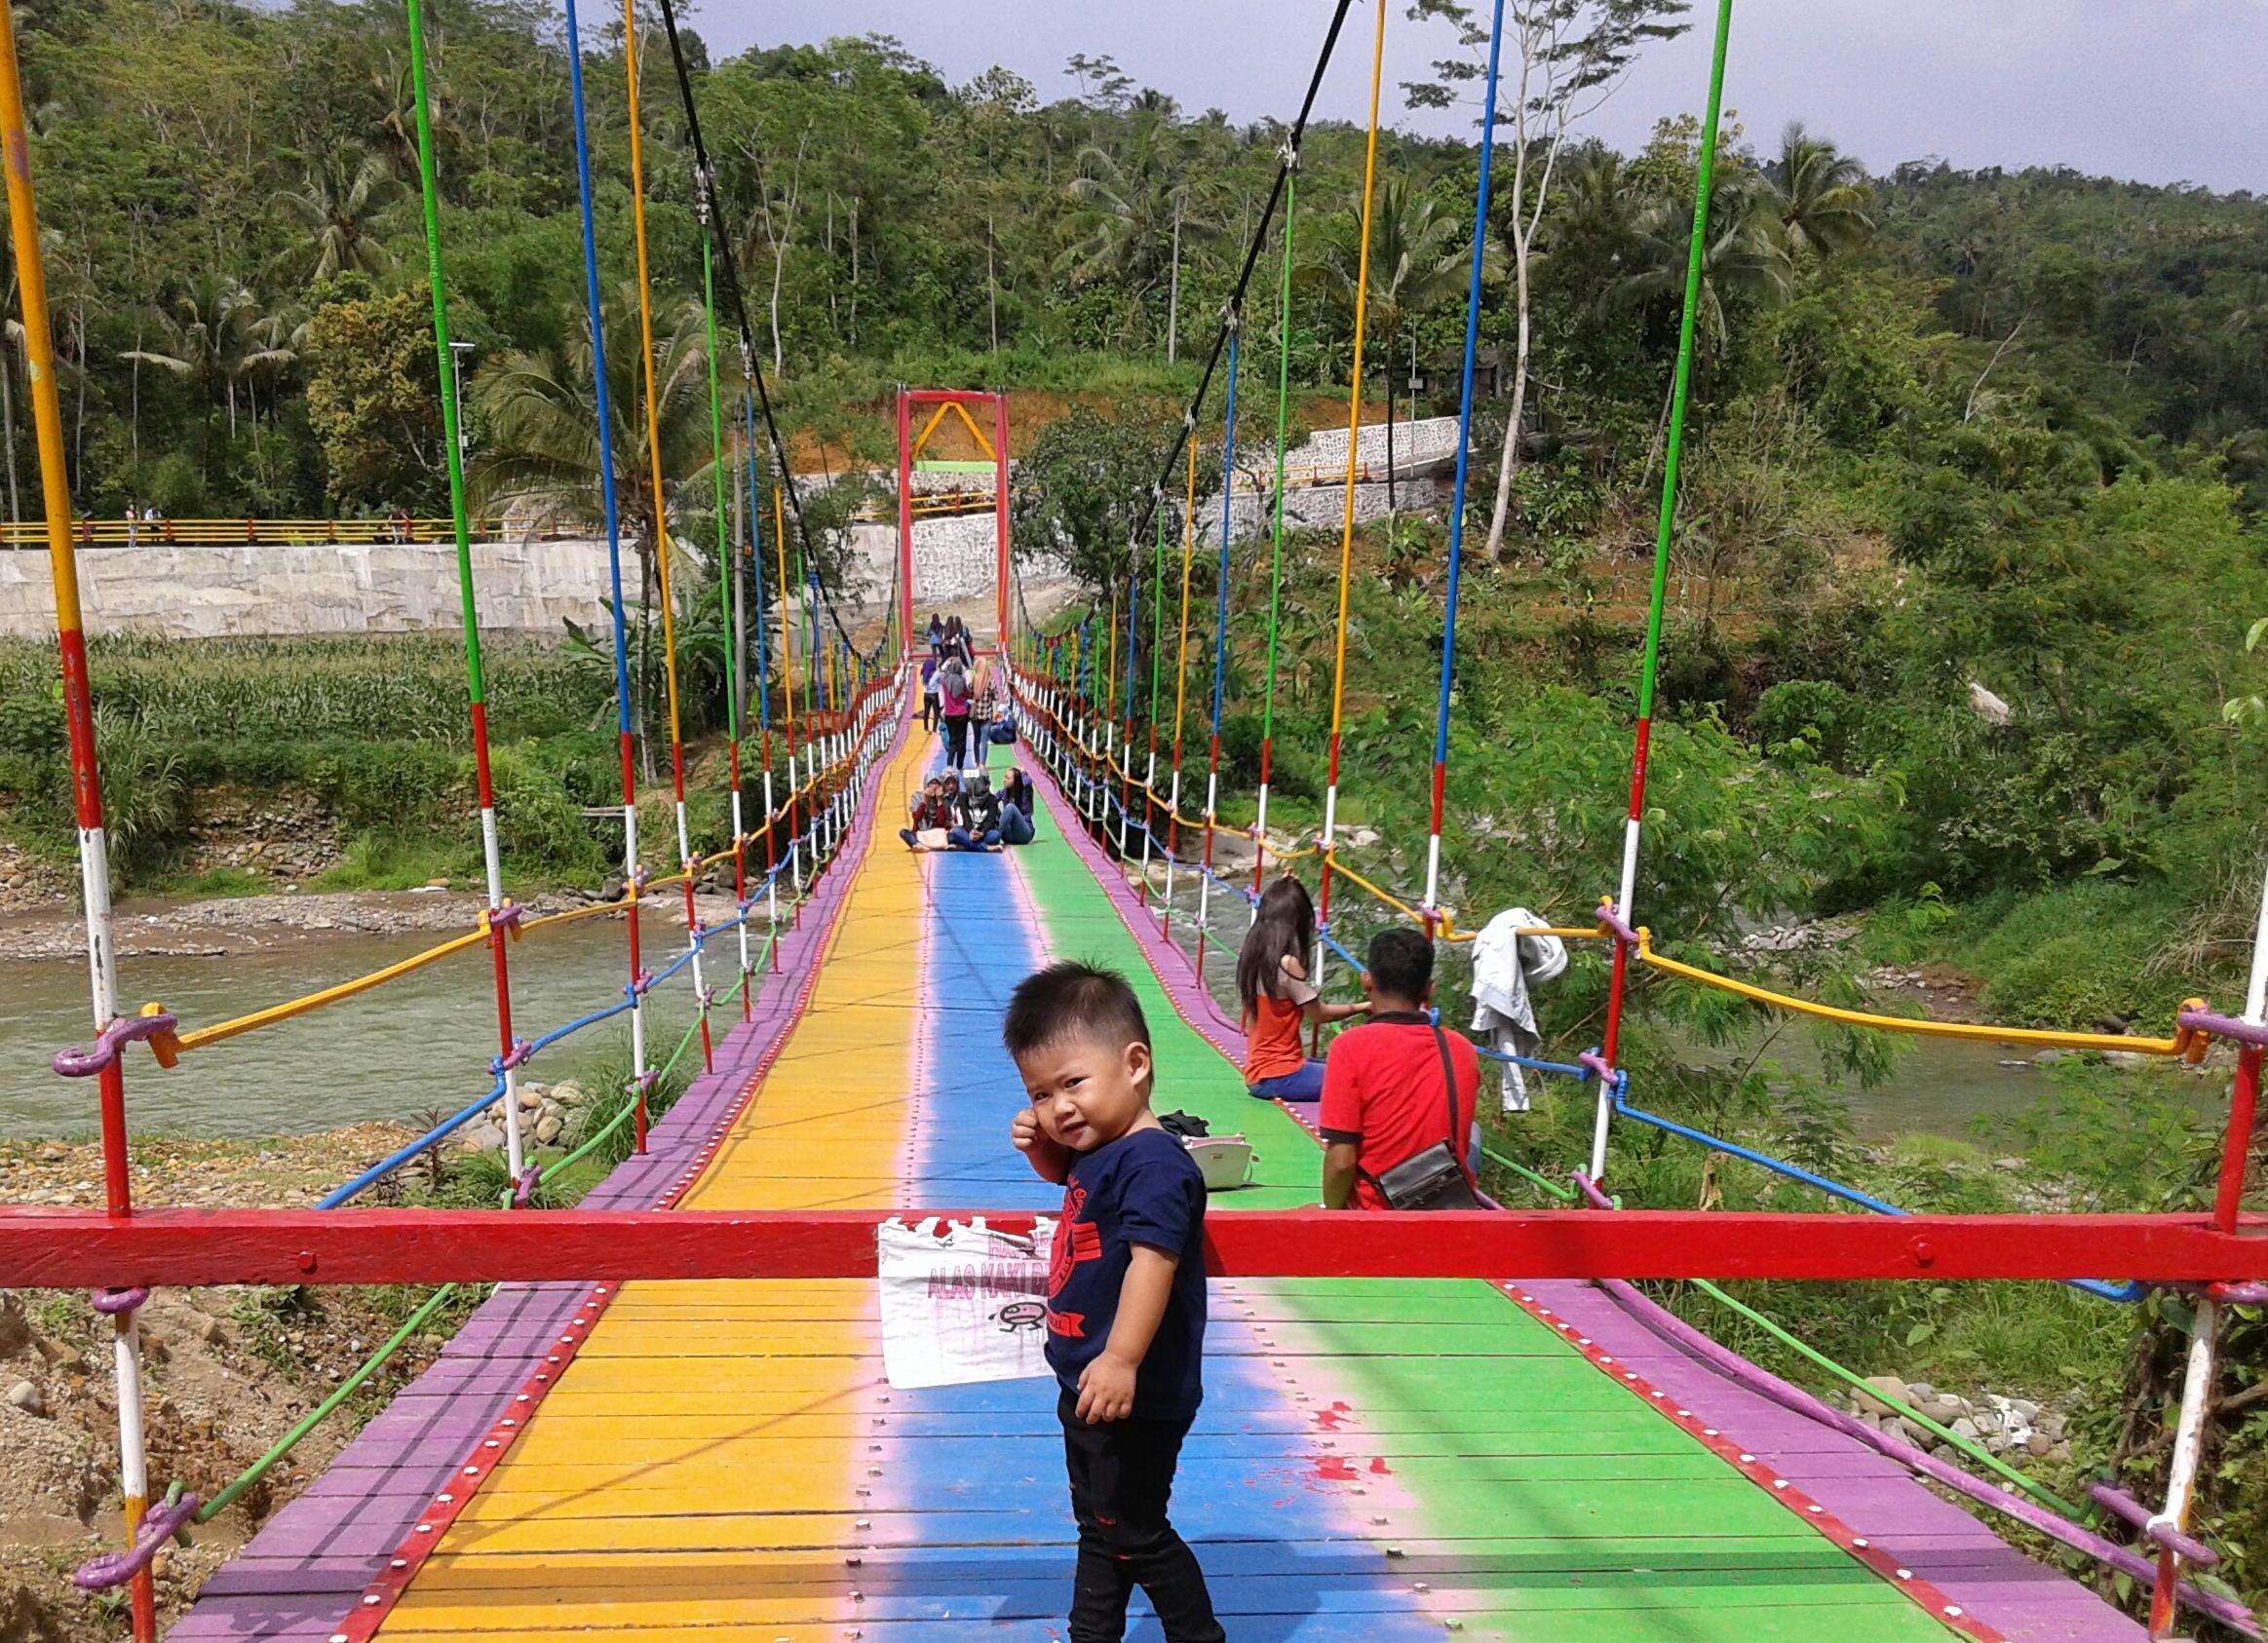 Igir Wringin Hijaunya Purbalingga Ketinggian Sanggar Pena Desa Pelangi Jembatan